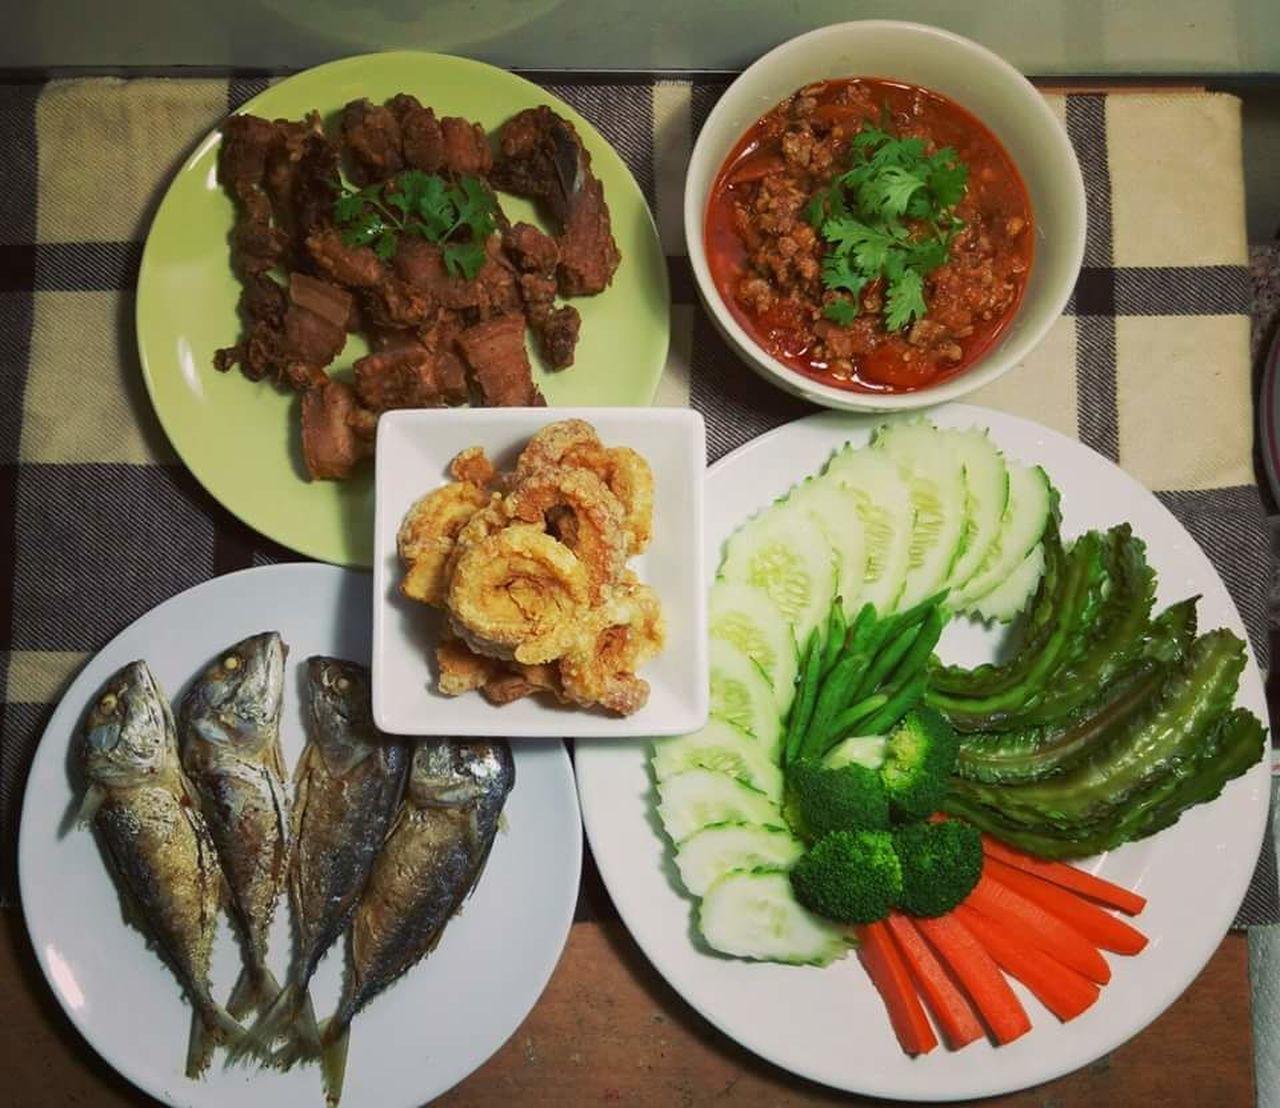 A big meal with my family Food I Like Thai Food Homemade